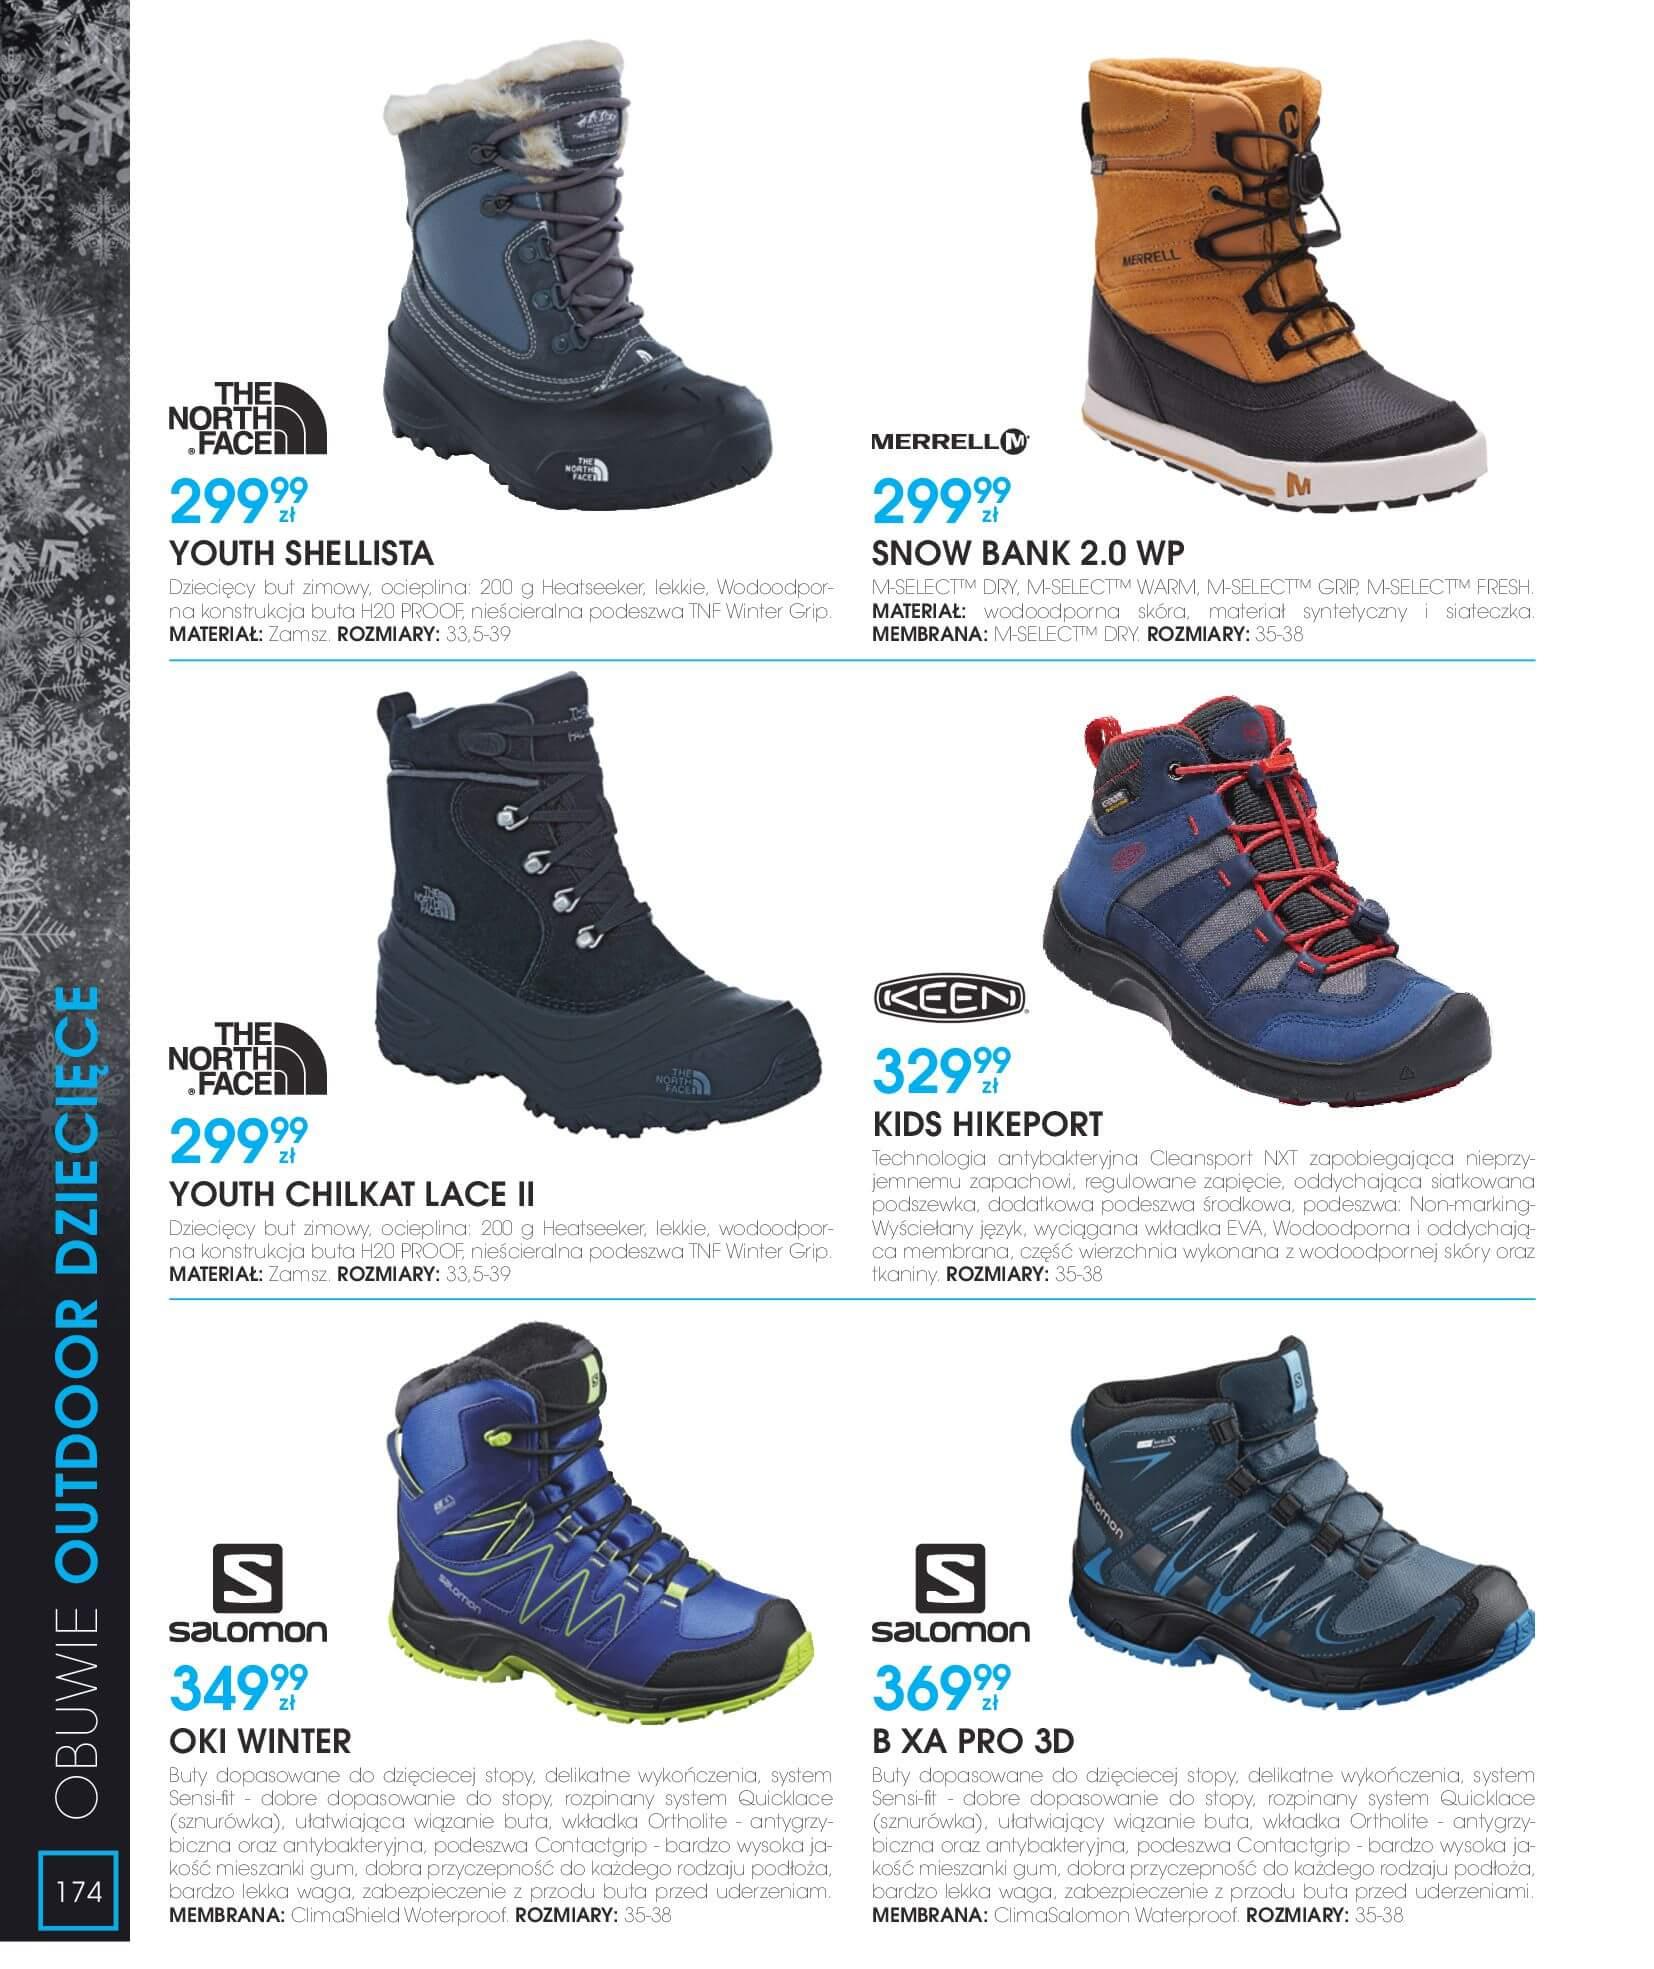 Gazetka Go Sport - Katalog Zima 2017/2018-12.11.2017-28.02.2018-page-174